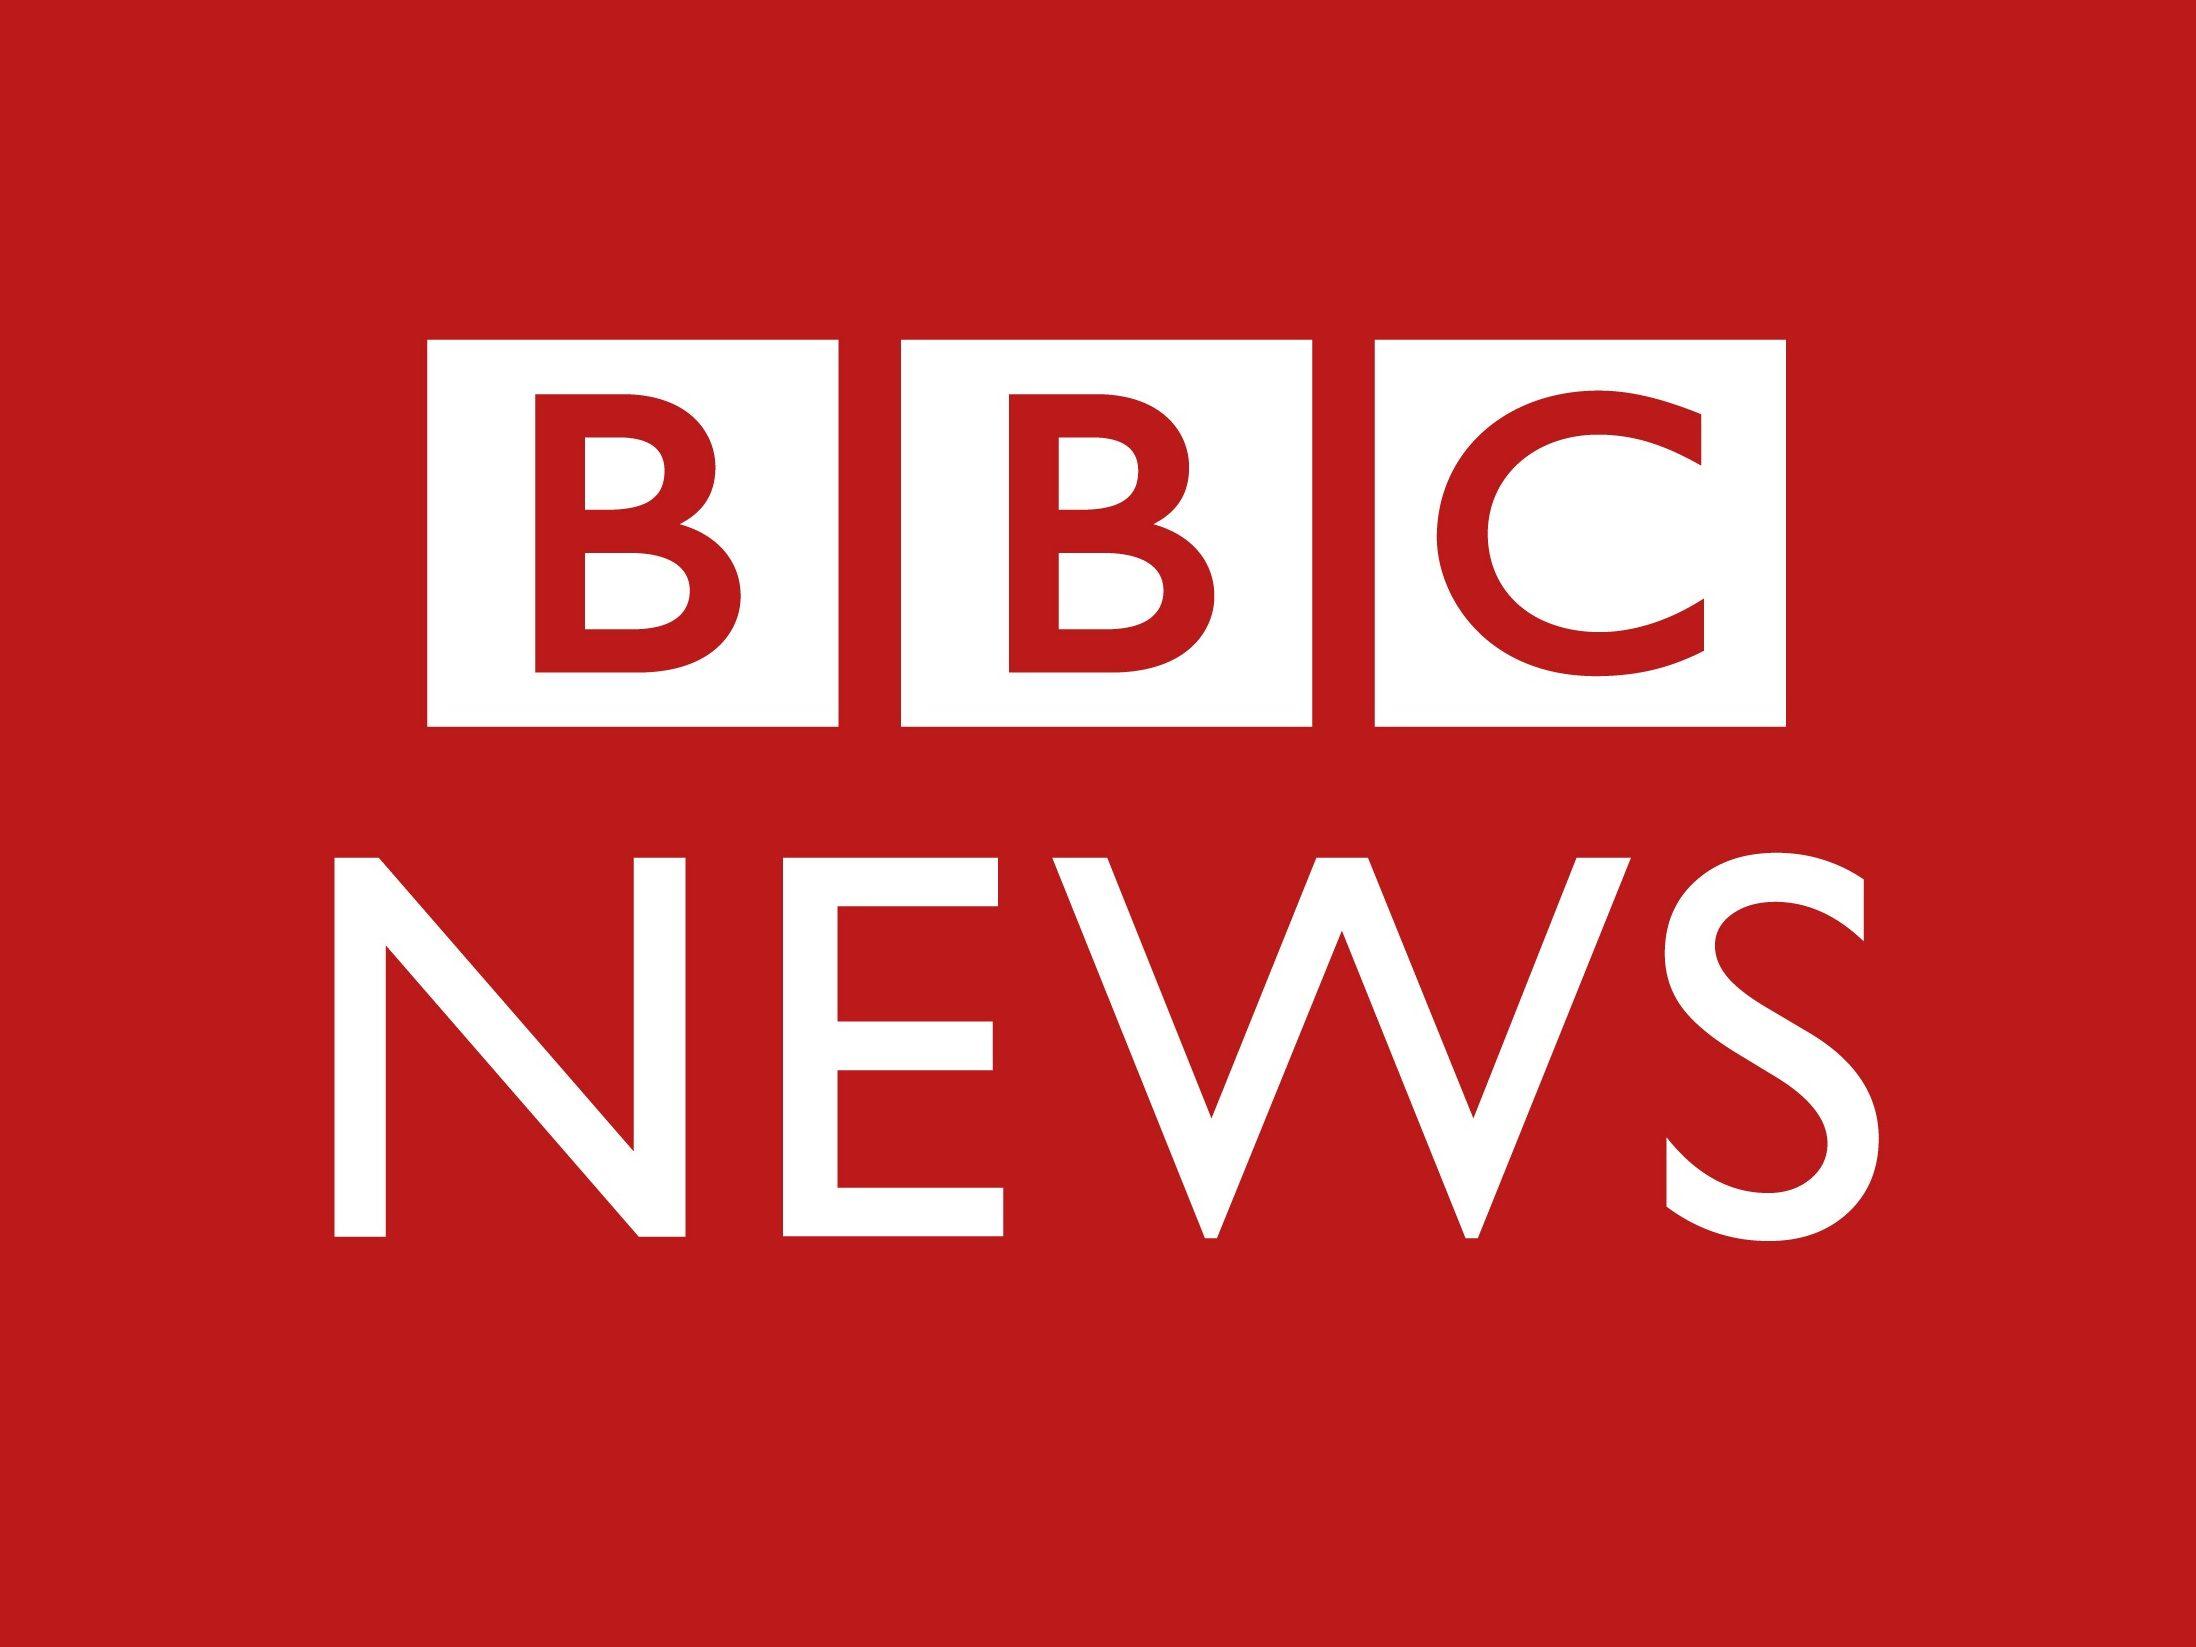 bbc-news-RED.jpg